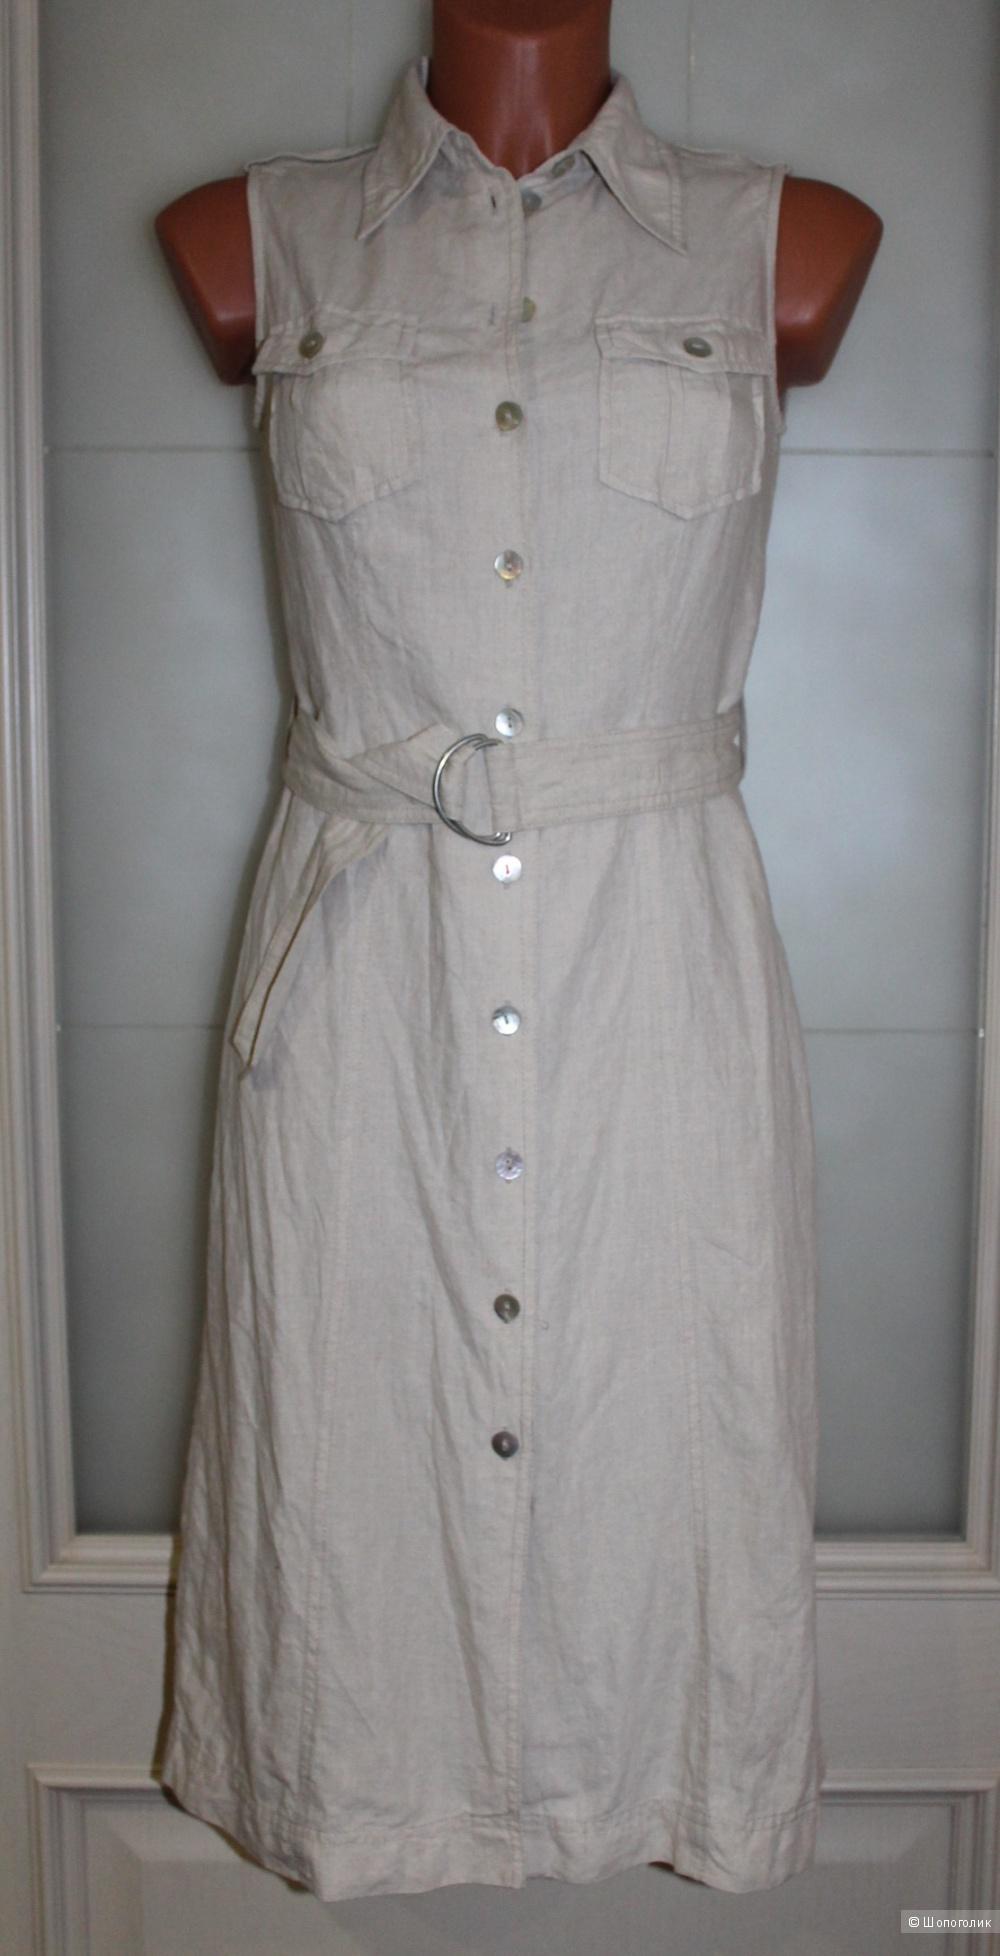 Льняной сарафан-рубашка HENNES, размер 36-38